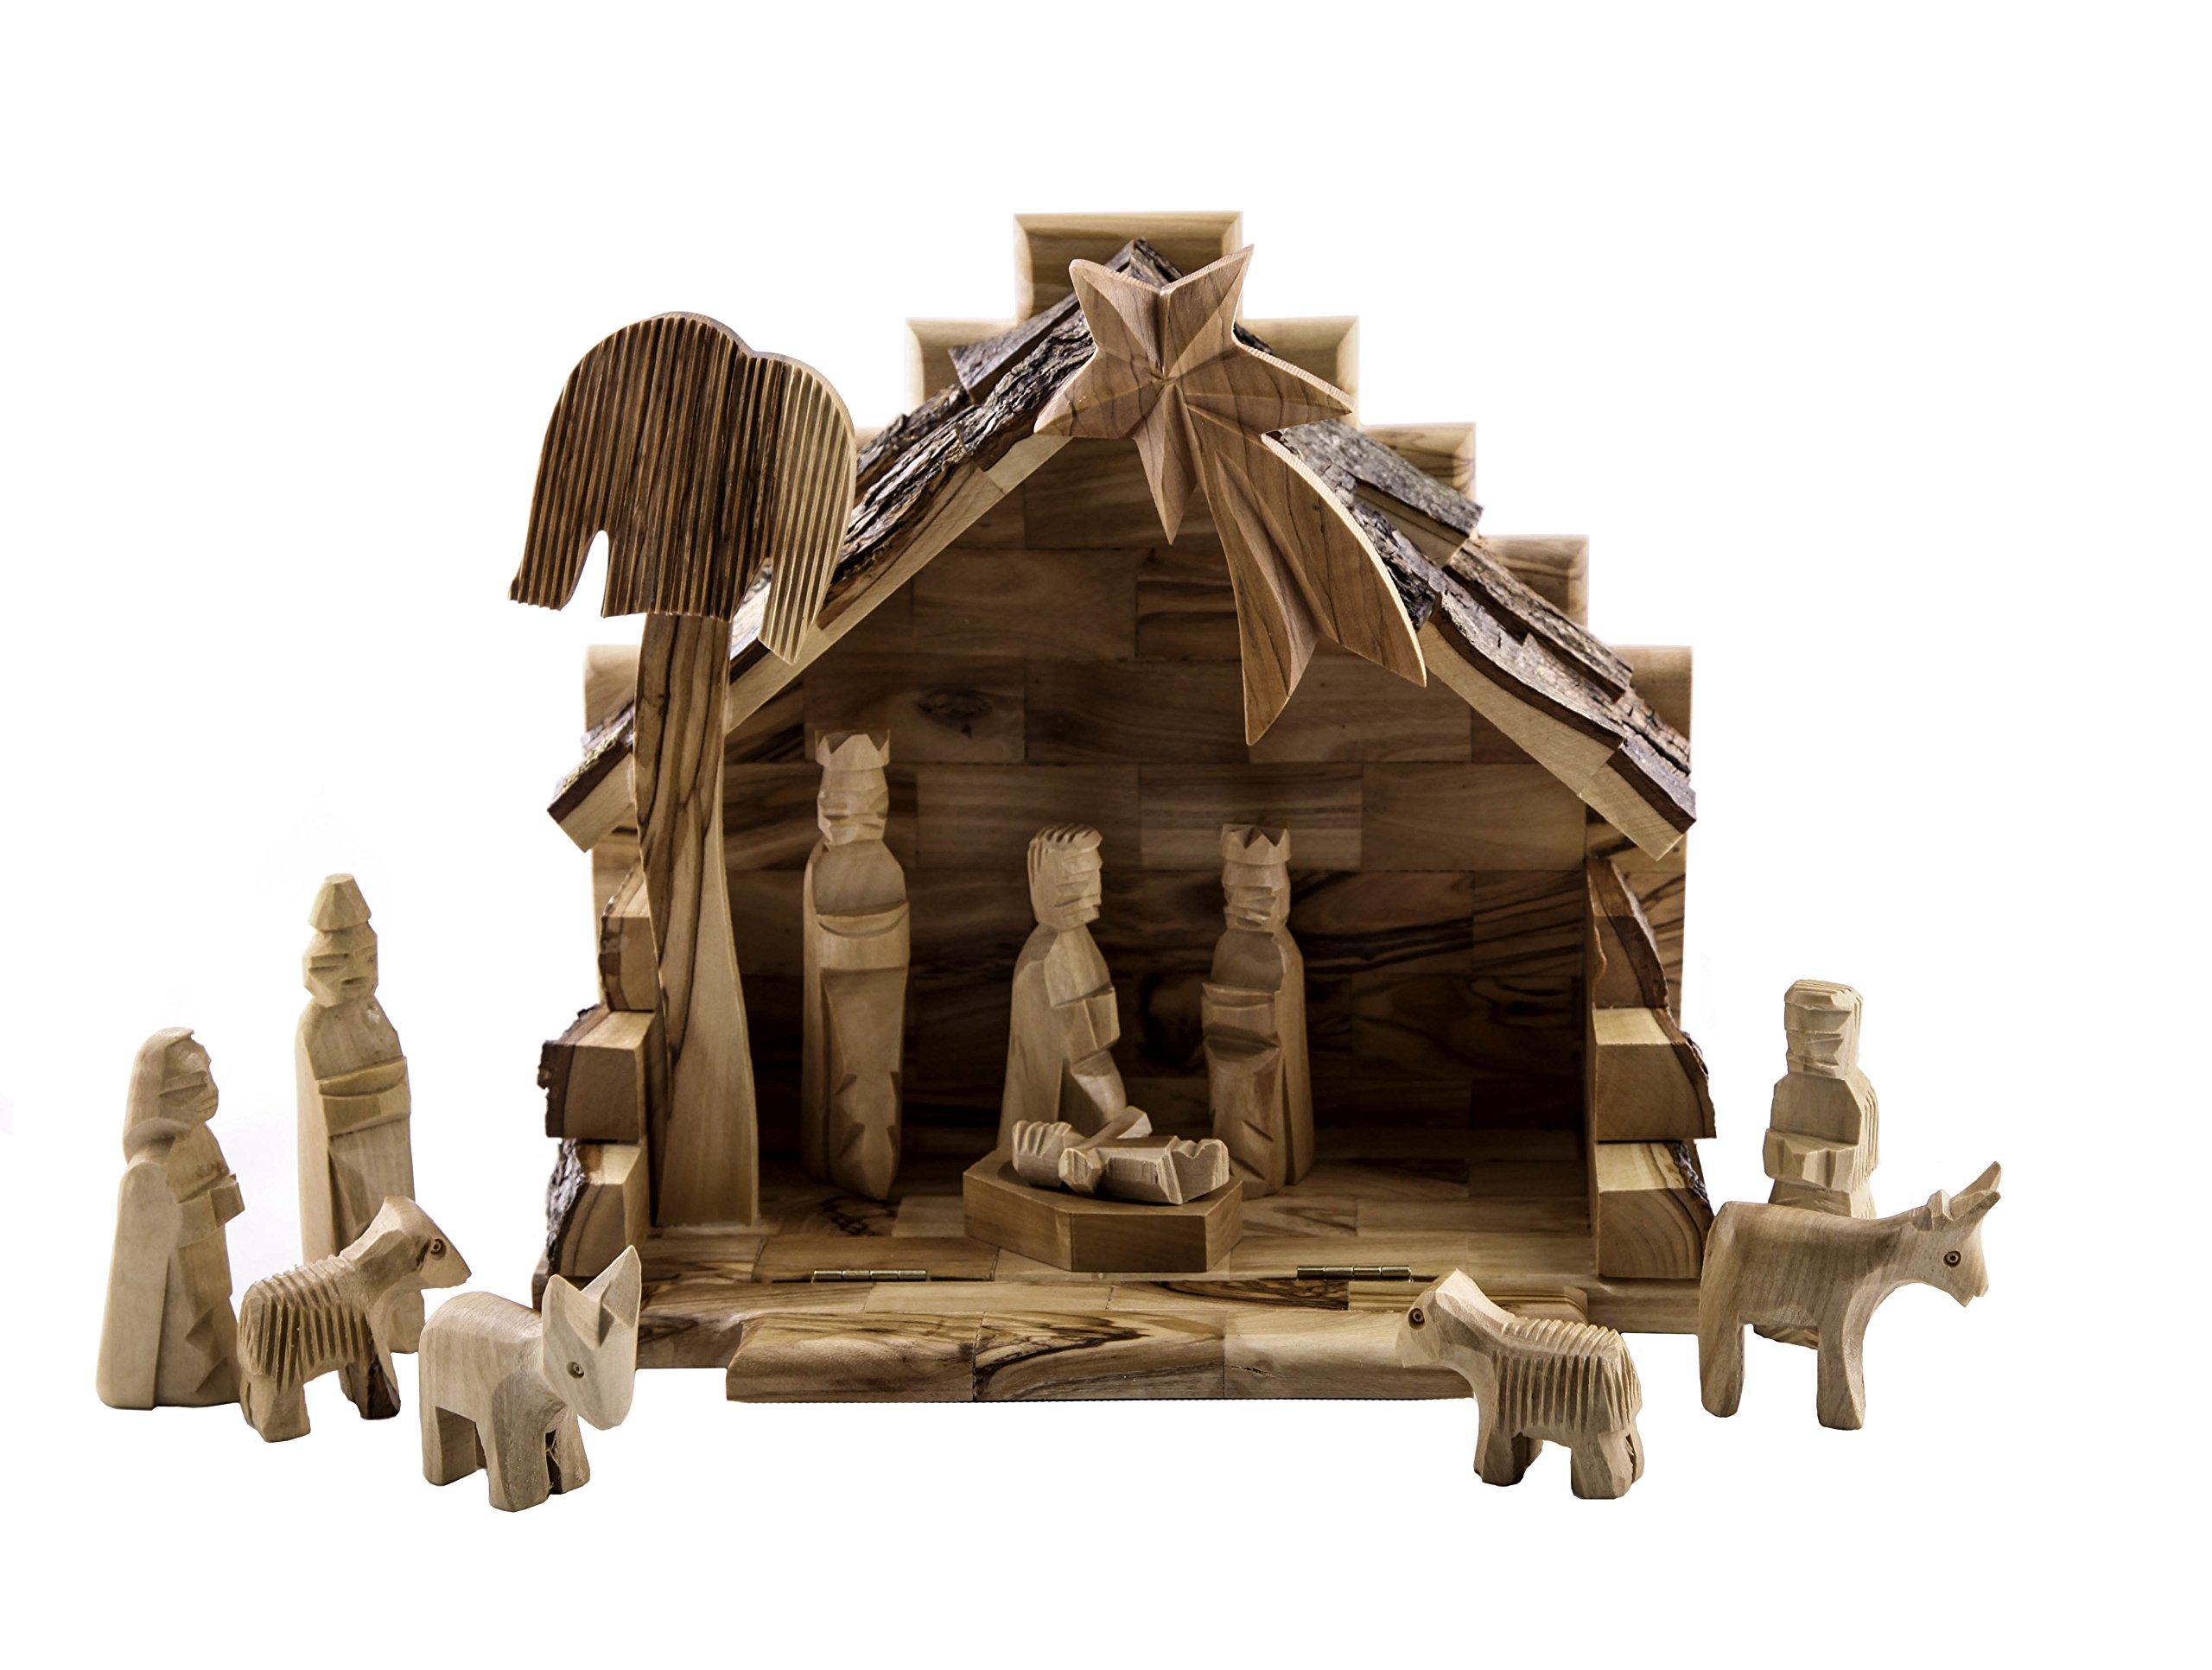 Queens of Christmas EW-NATIVITY-06 Decorative Nativity Figurine, 6'', Natural Wood